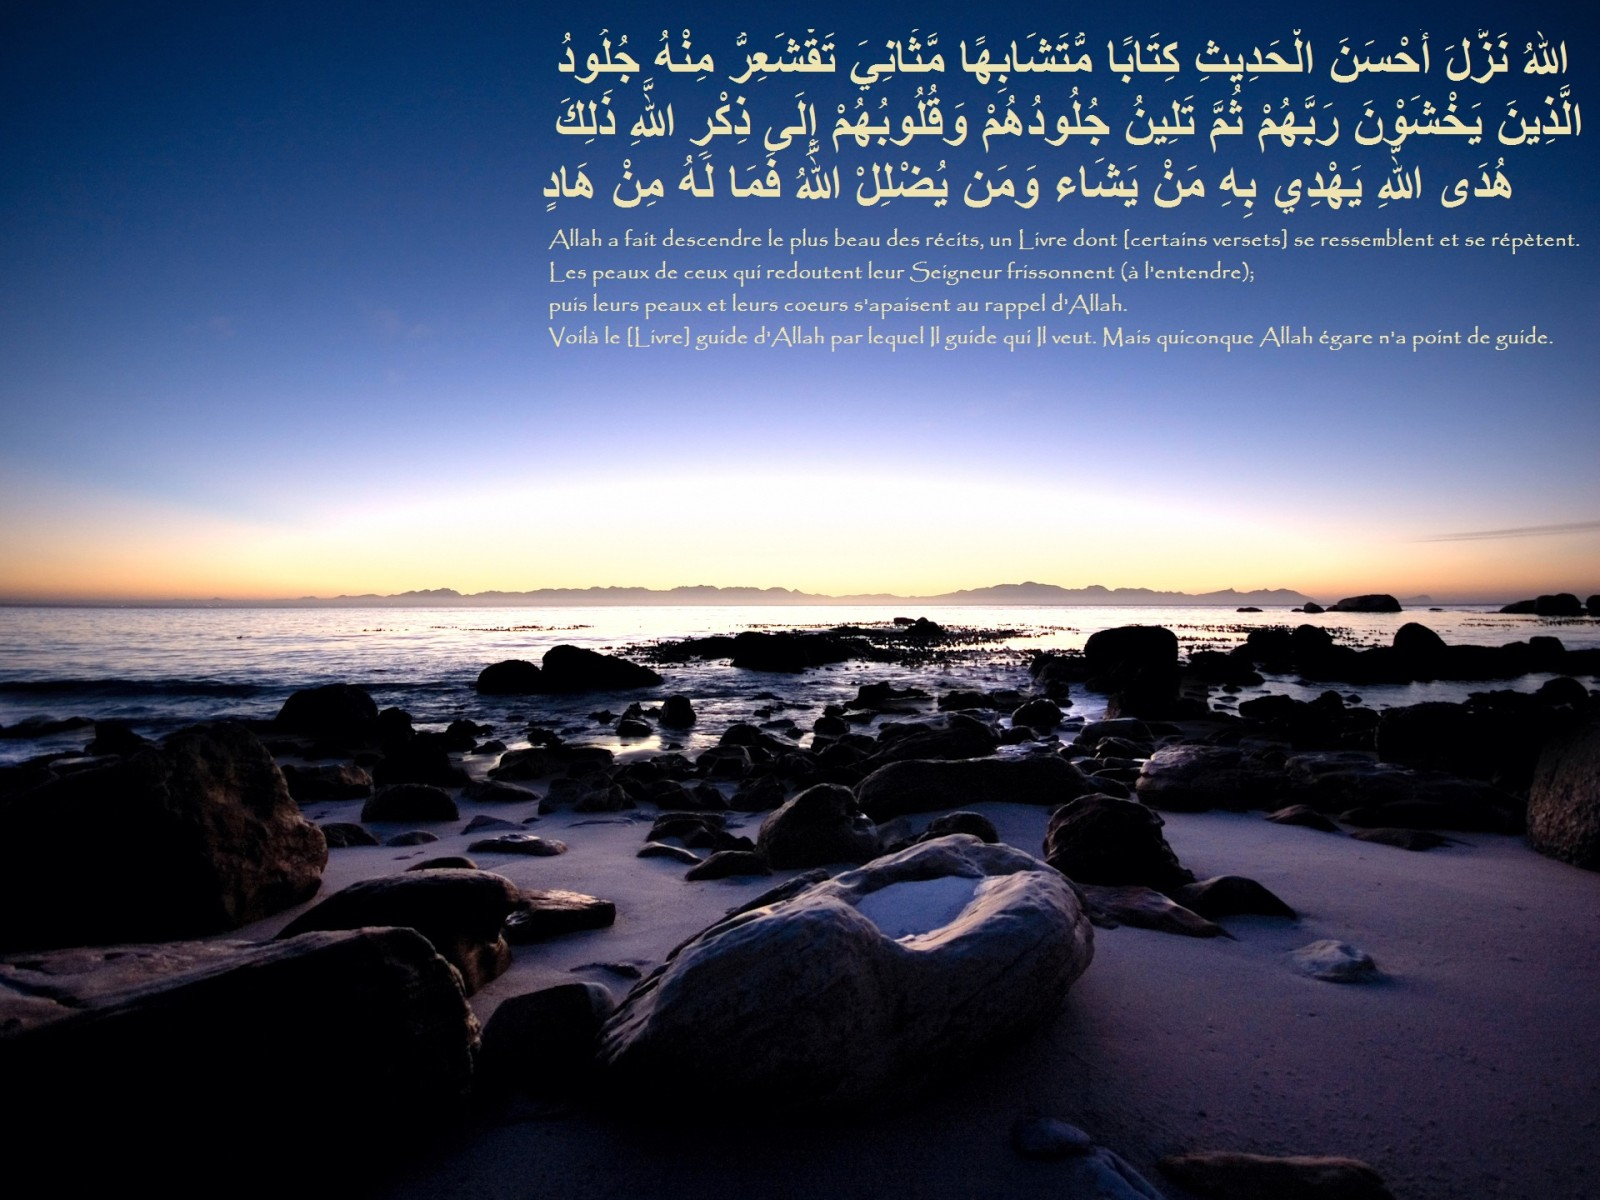 Le chatiment de la tombe Selon le Coran et la Sounnah